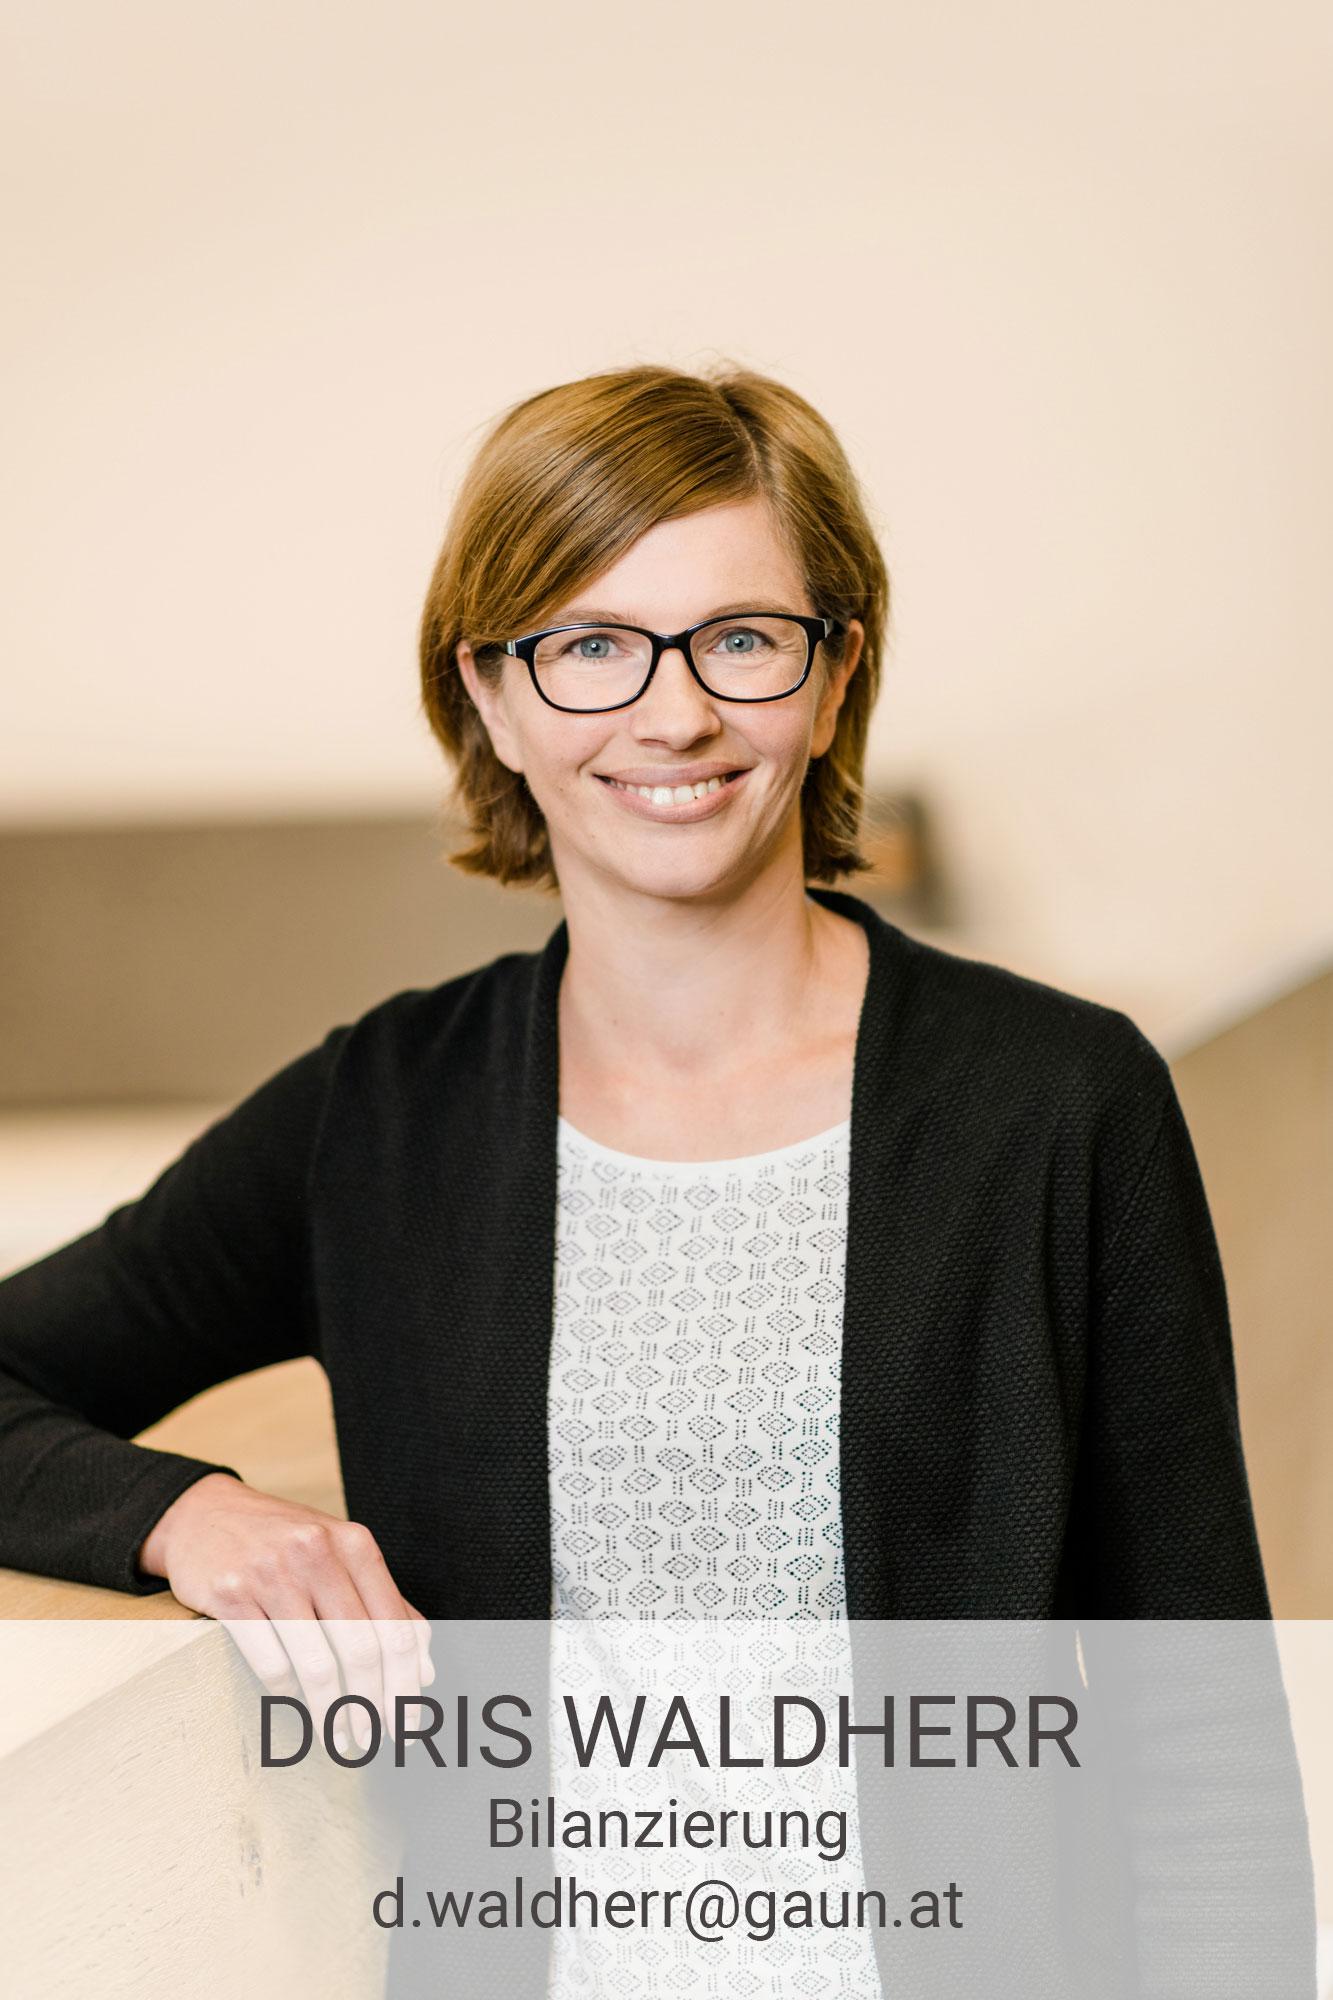 Doris Waldherr